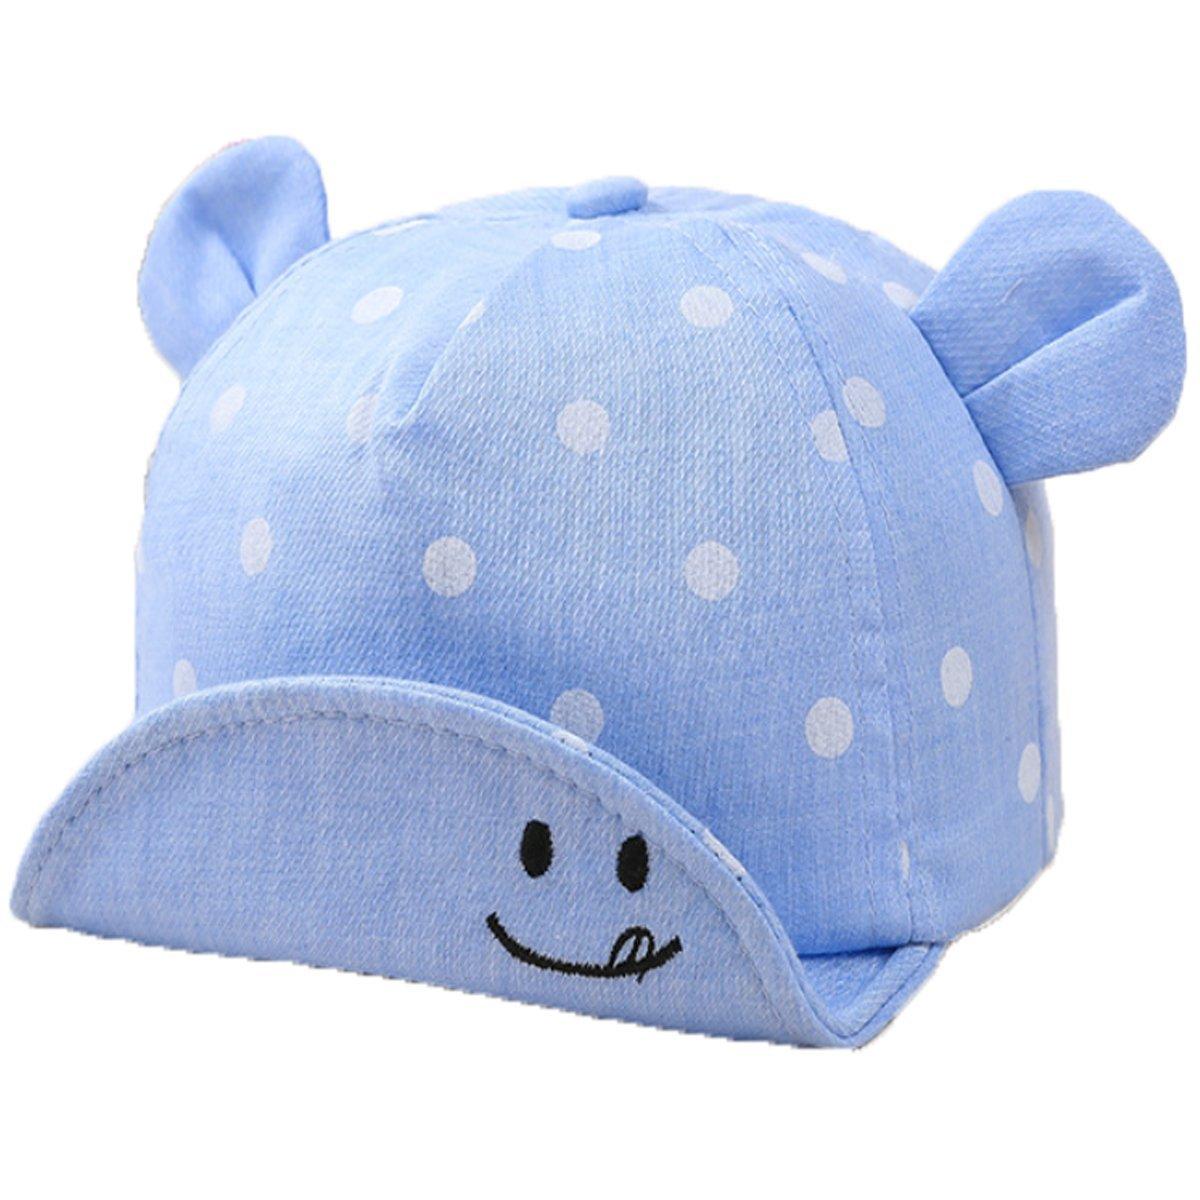 bb70aada14a Annvivi Dot Baby Summer Caps Girl Boys Sun Hat with Ear (Blue)  Amazon.ca   Clothing   Accessories